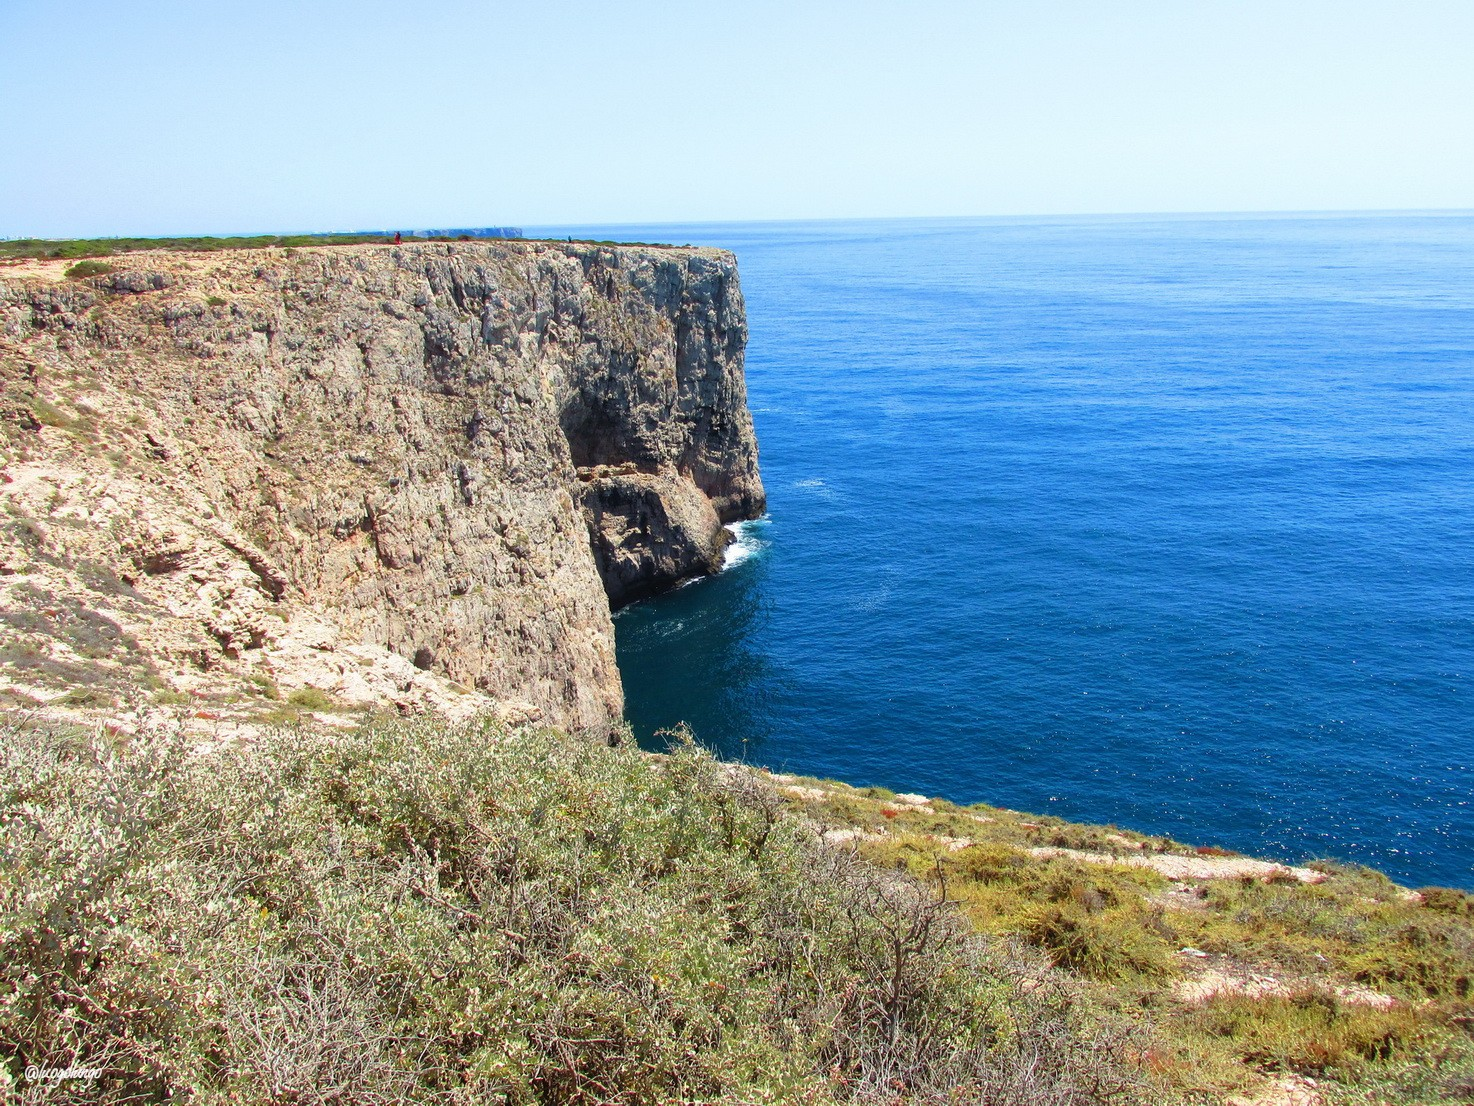 Algarve_Capo San Vincenzo_luogolungo